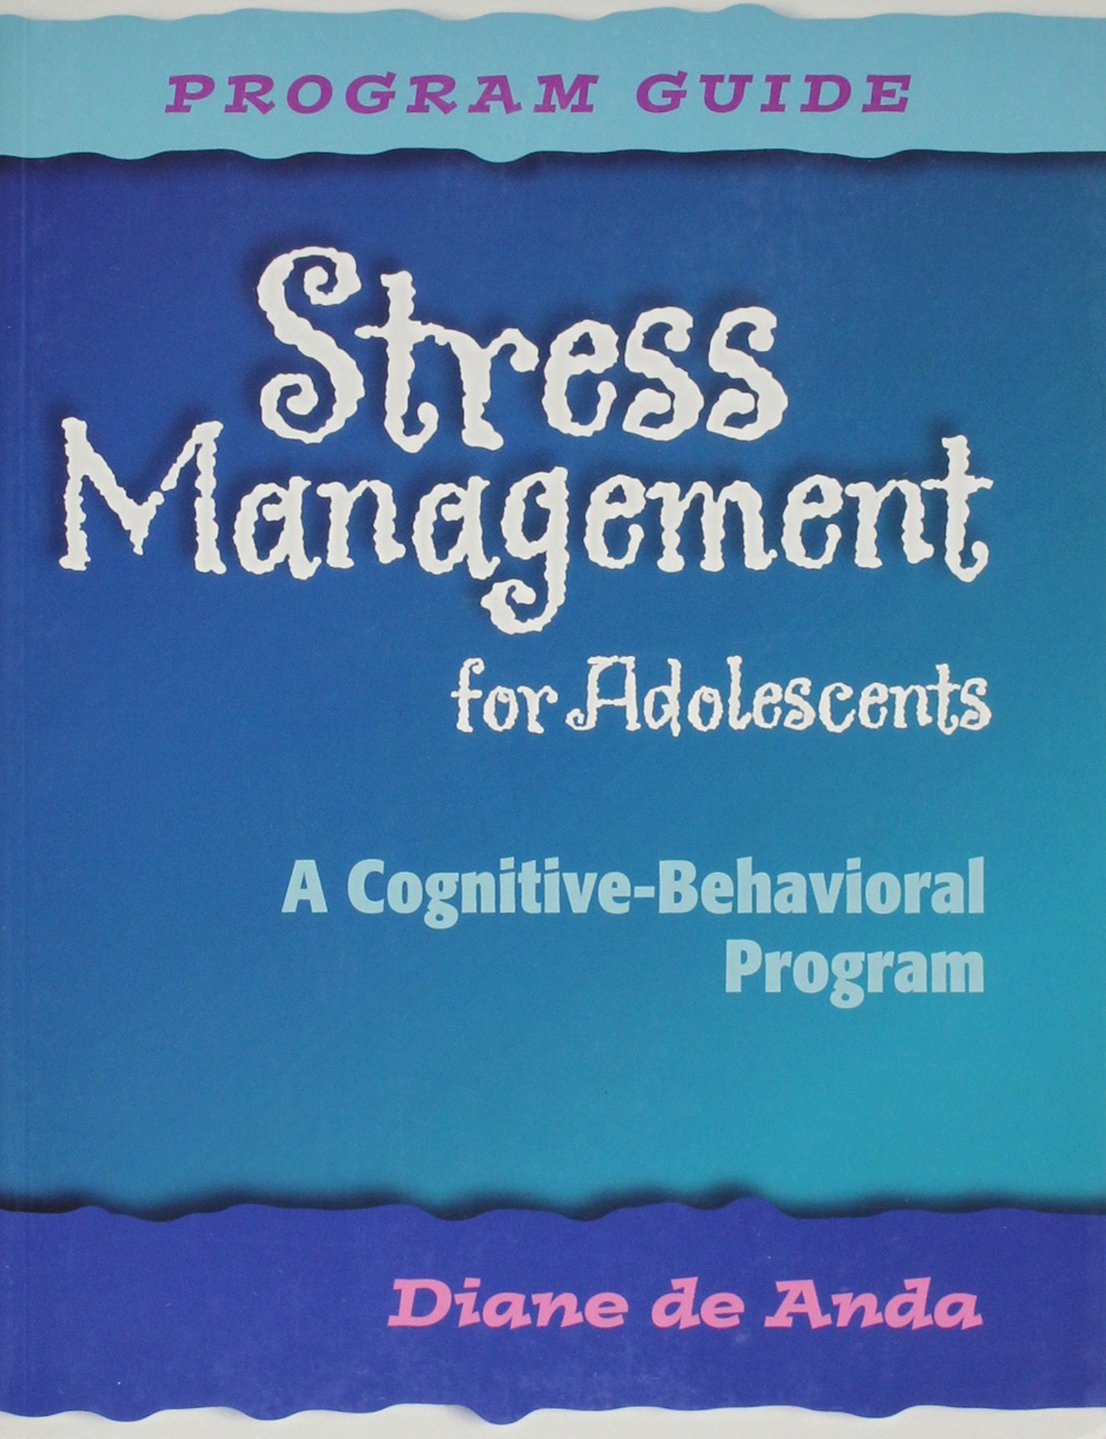 Stress Management for Adolescents: A Cognitive-Behavioral Program (Guide, CD and 5 Student Manuals) pdf epub